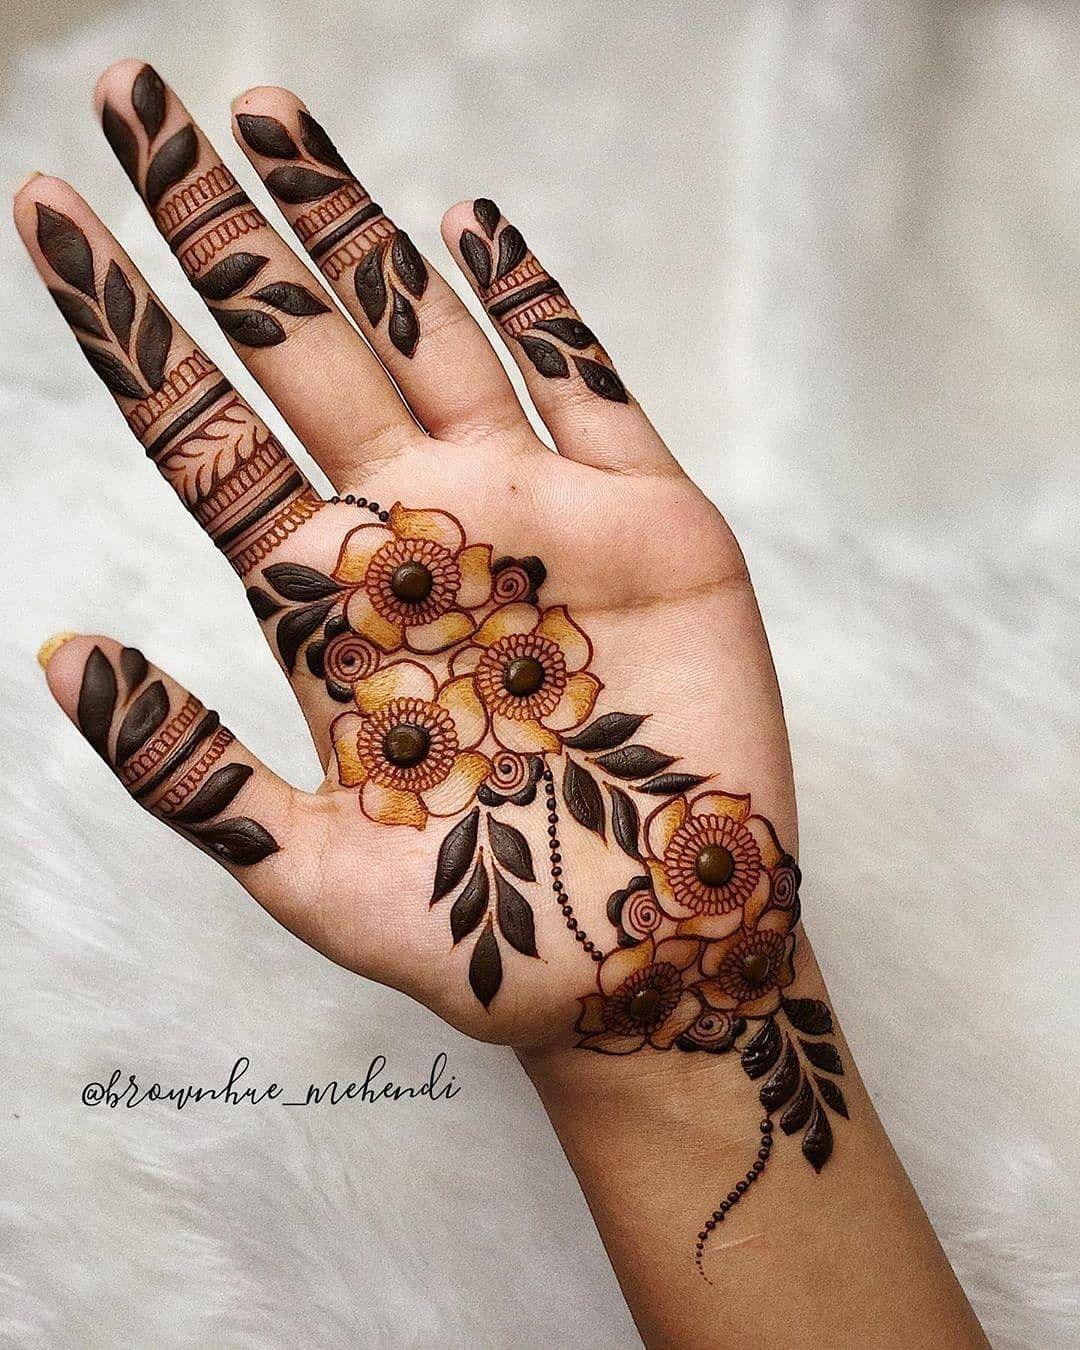 30 Stylish And Elegant Finger Mehndi Designs In 2020 Mehndi Designs Back Hand Mehndi Designs Unique Mehndi Designs